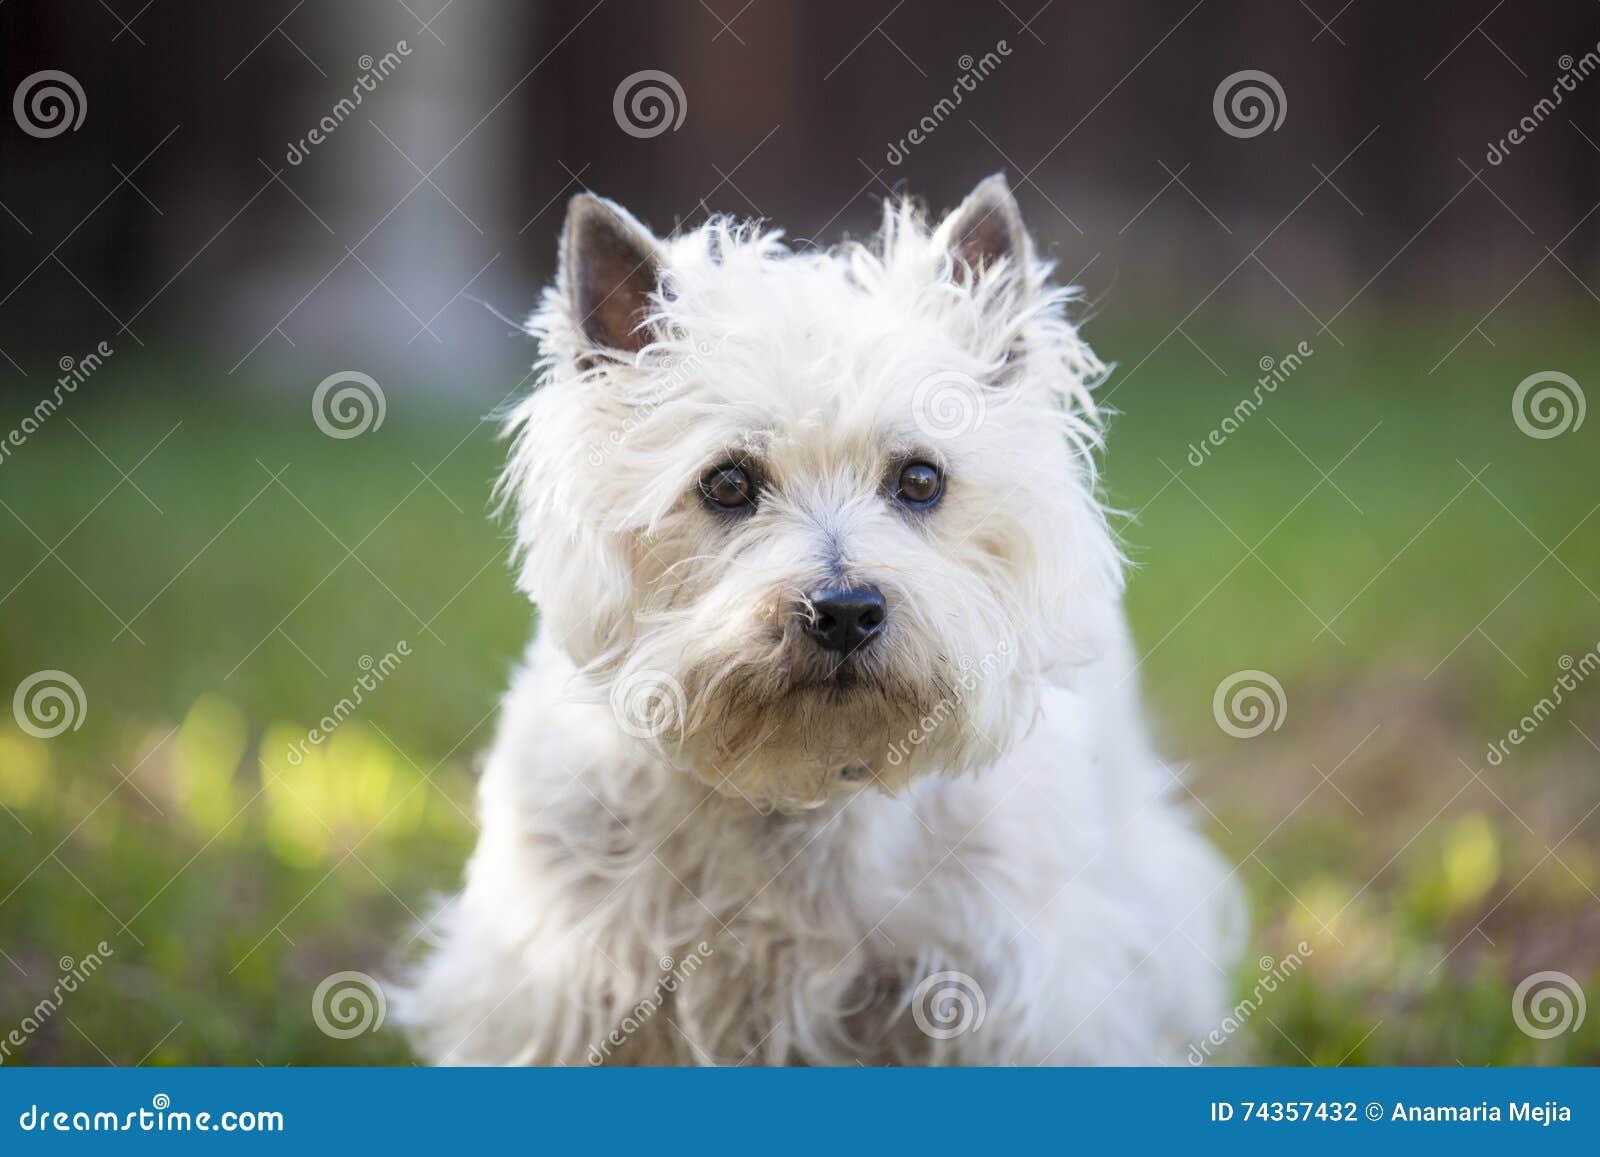 Cairn Terrier posing outdoors